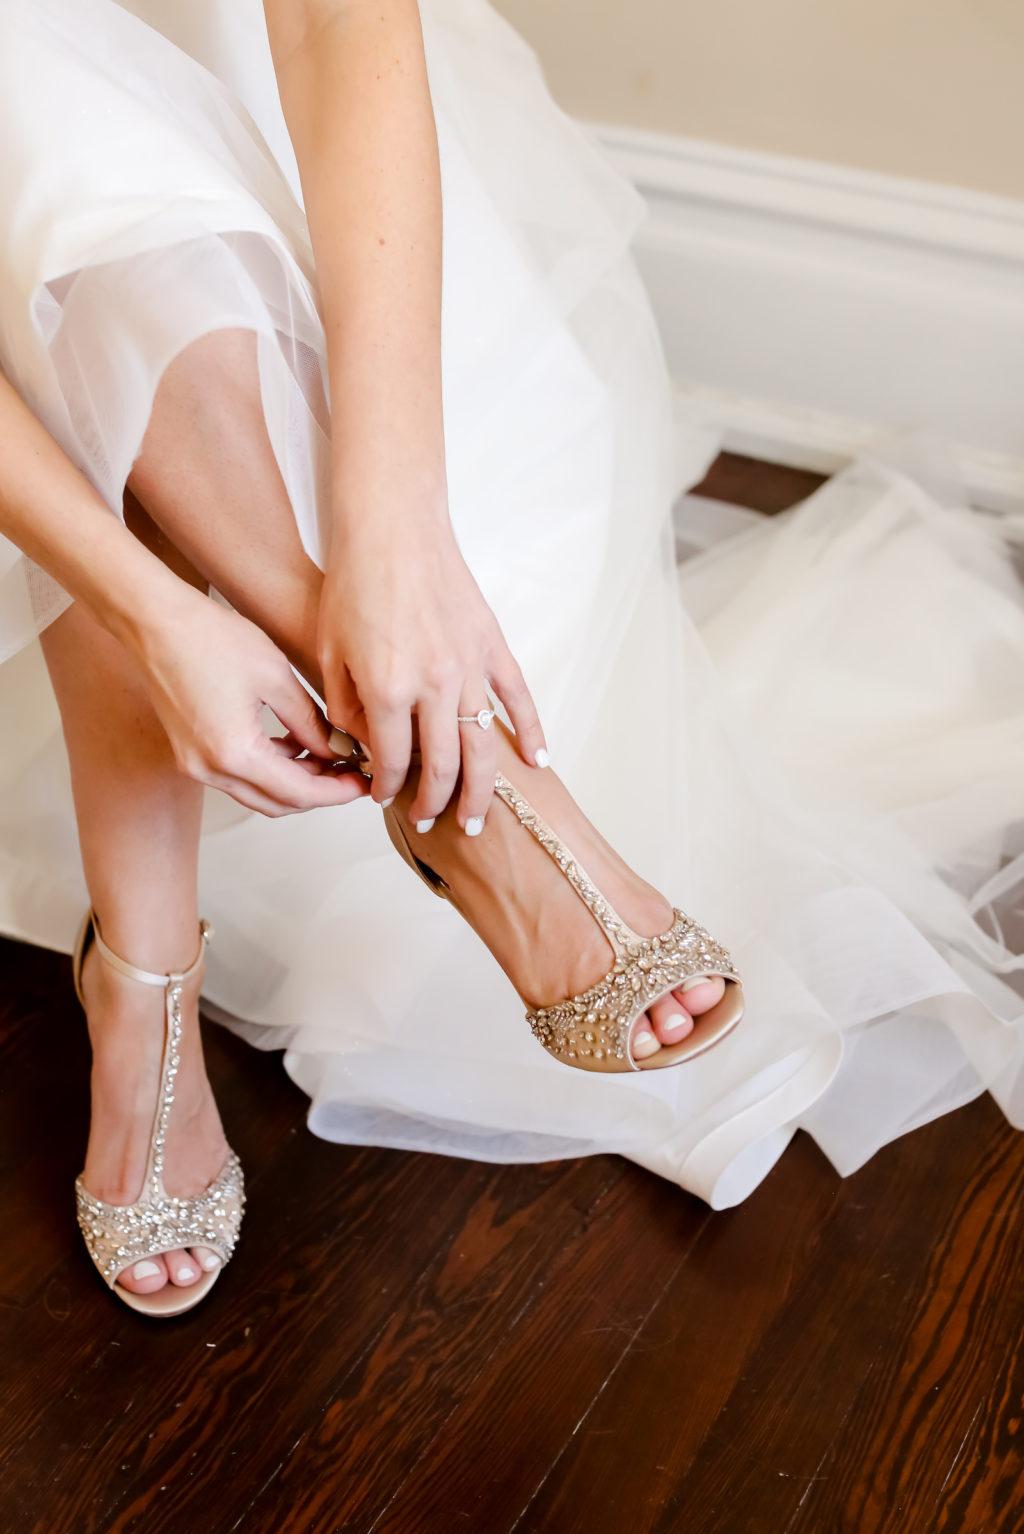 Florida Bride Getting Wedding Ready with Rhinestone Gold Wedding Shoes | Tampa Bay Wedding Photographer Lifelong Photography Studio